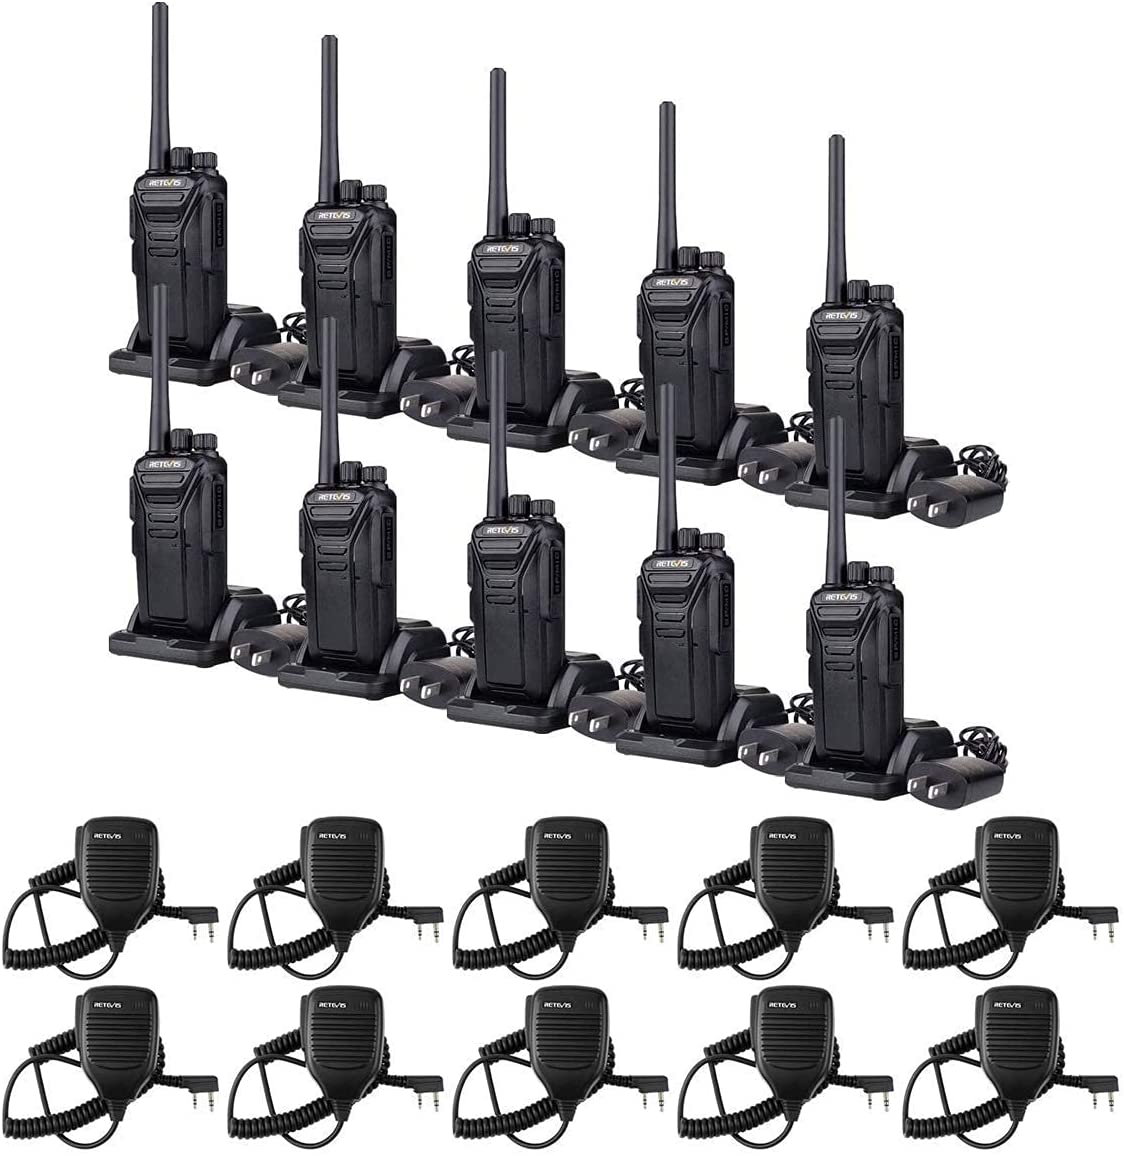 Retevis RT27 2 Way Radio Long excellence Max 84% OFF with Mi Bundle Range Pin Speaker